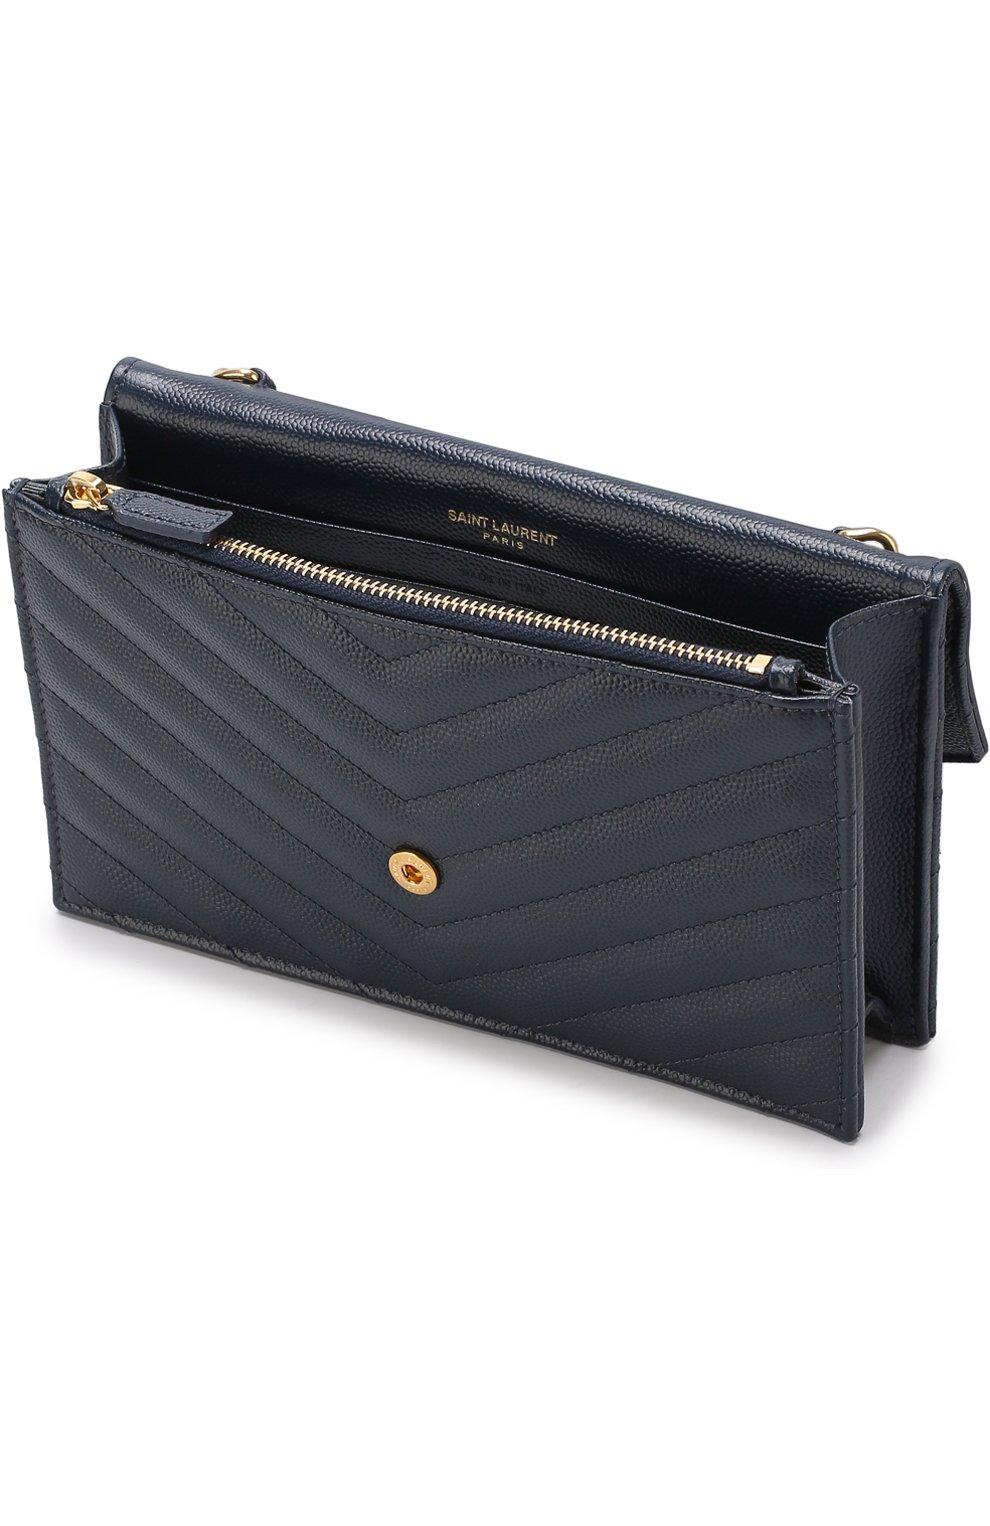 810efc7c6b140 Женская сумка monogram envelope mini SAINT LAURENT темно-синяя цвета ...